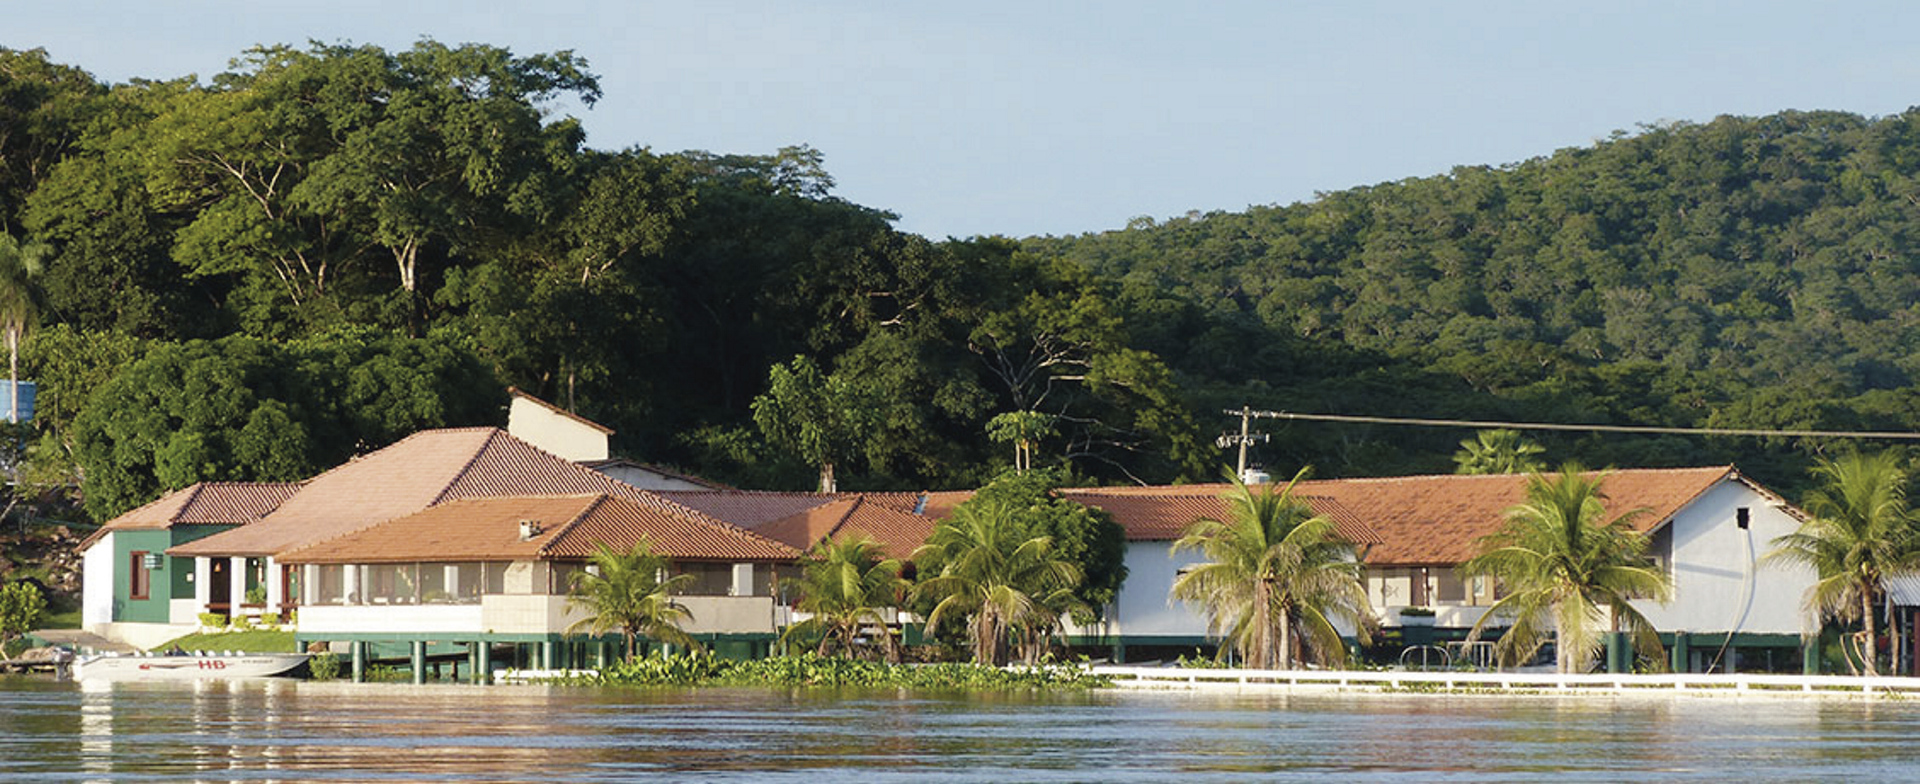 Baiazinha Lodge